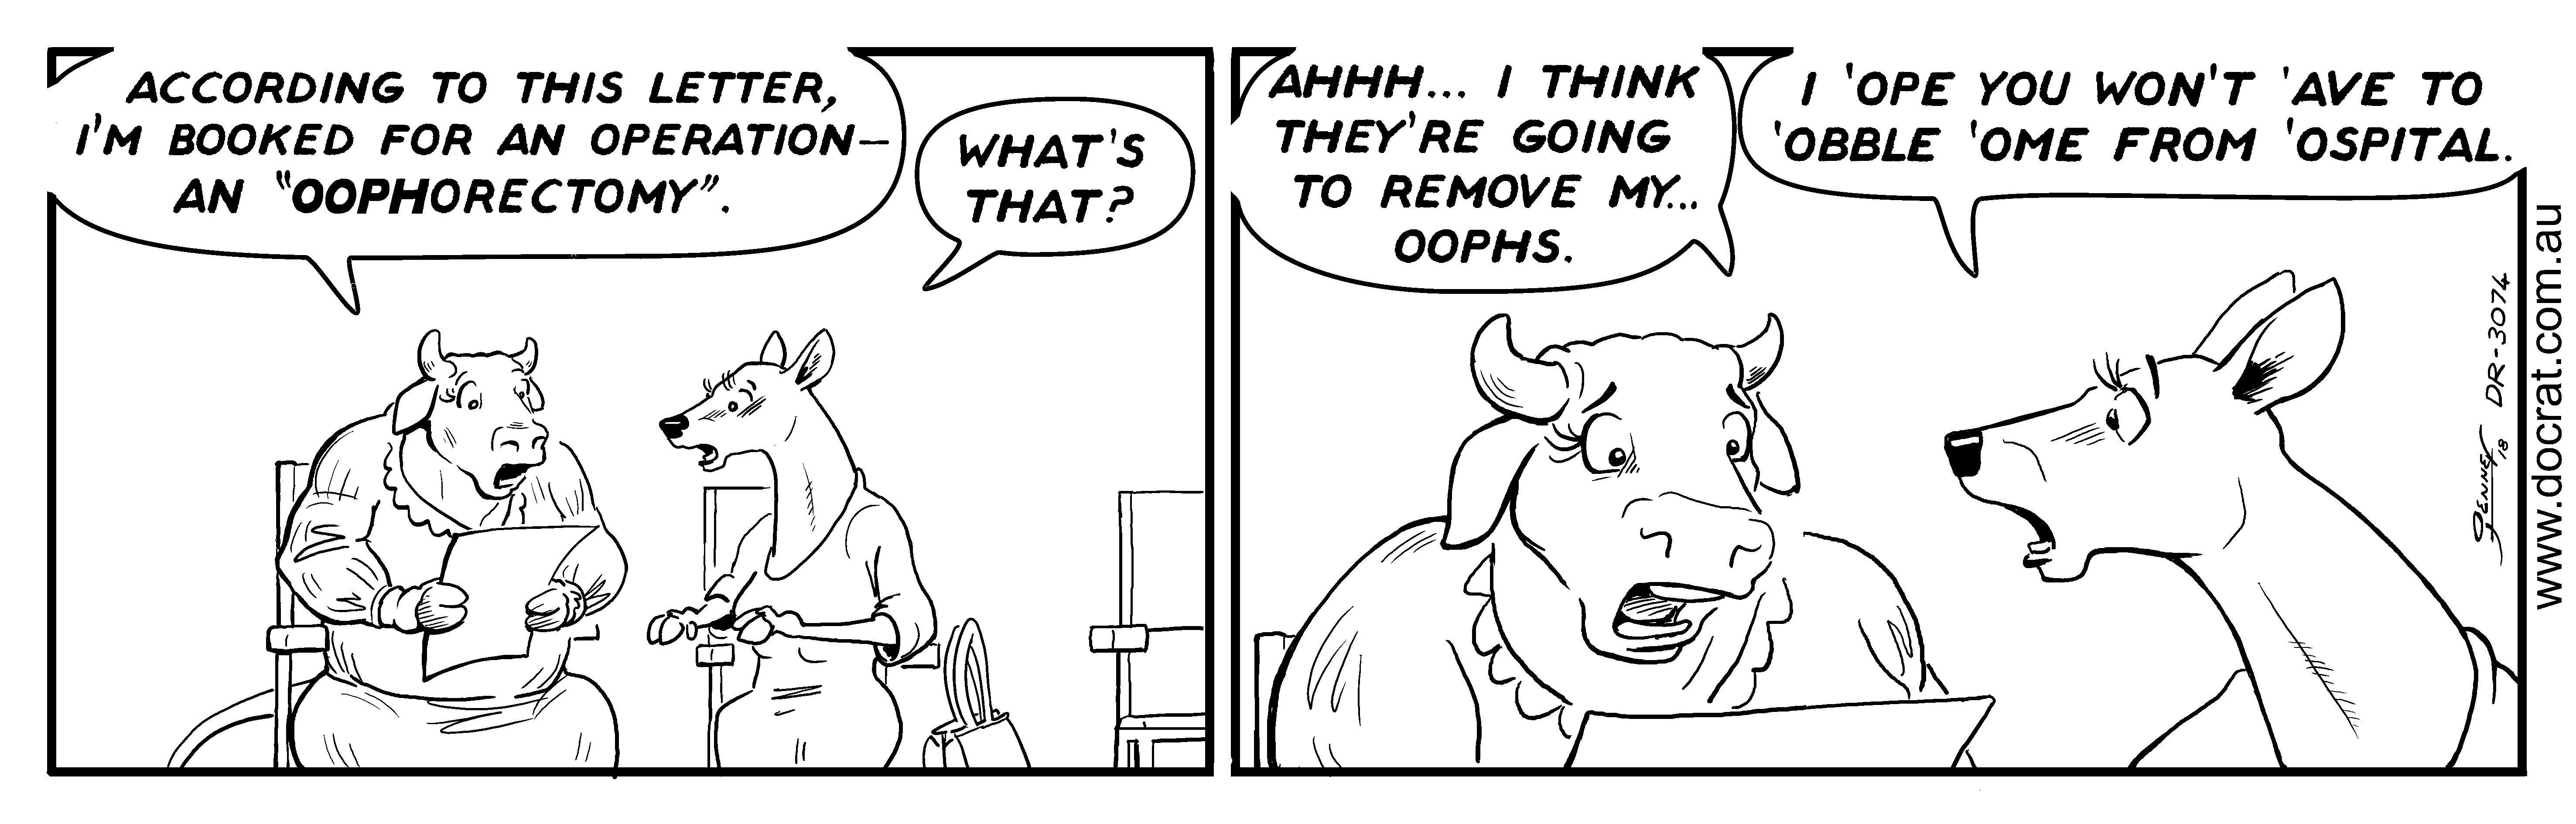 20180920